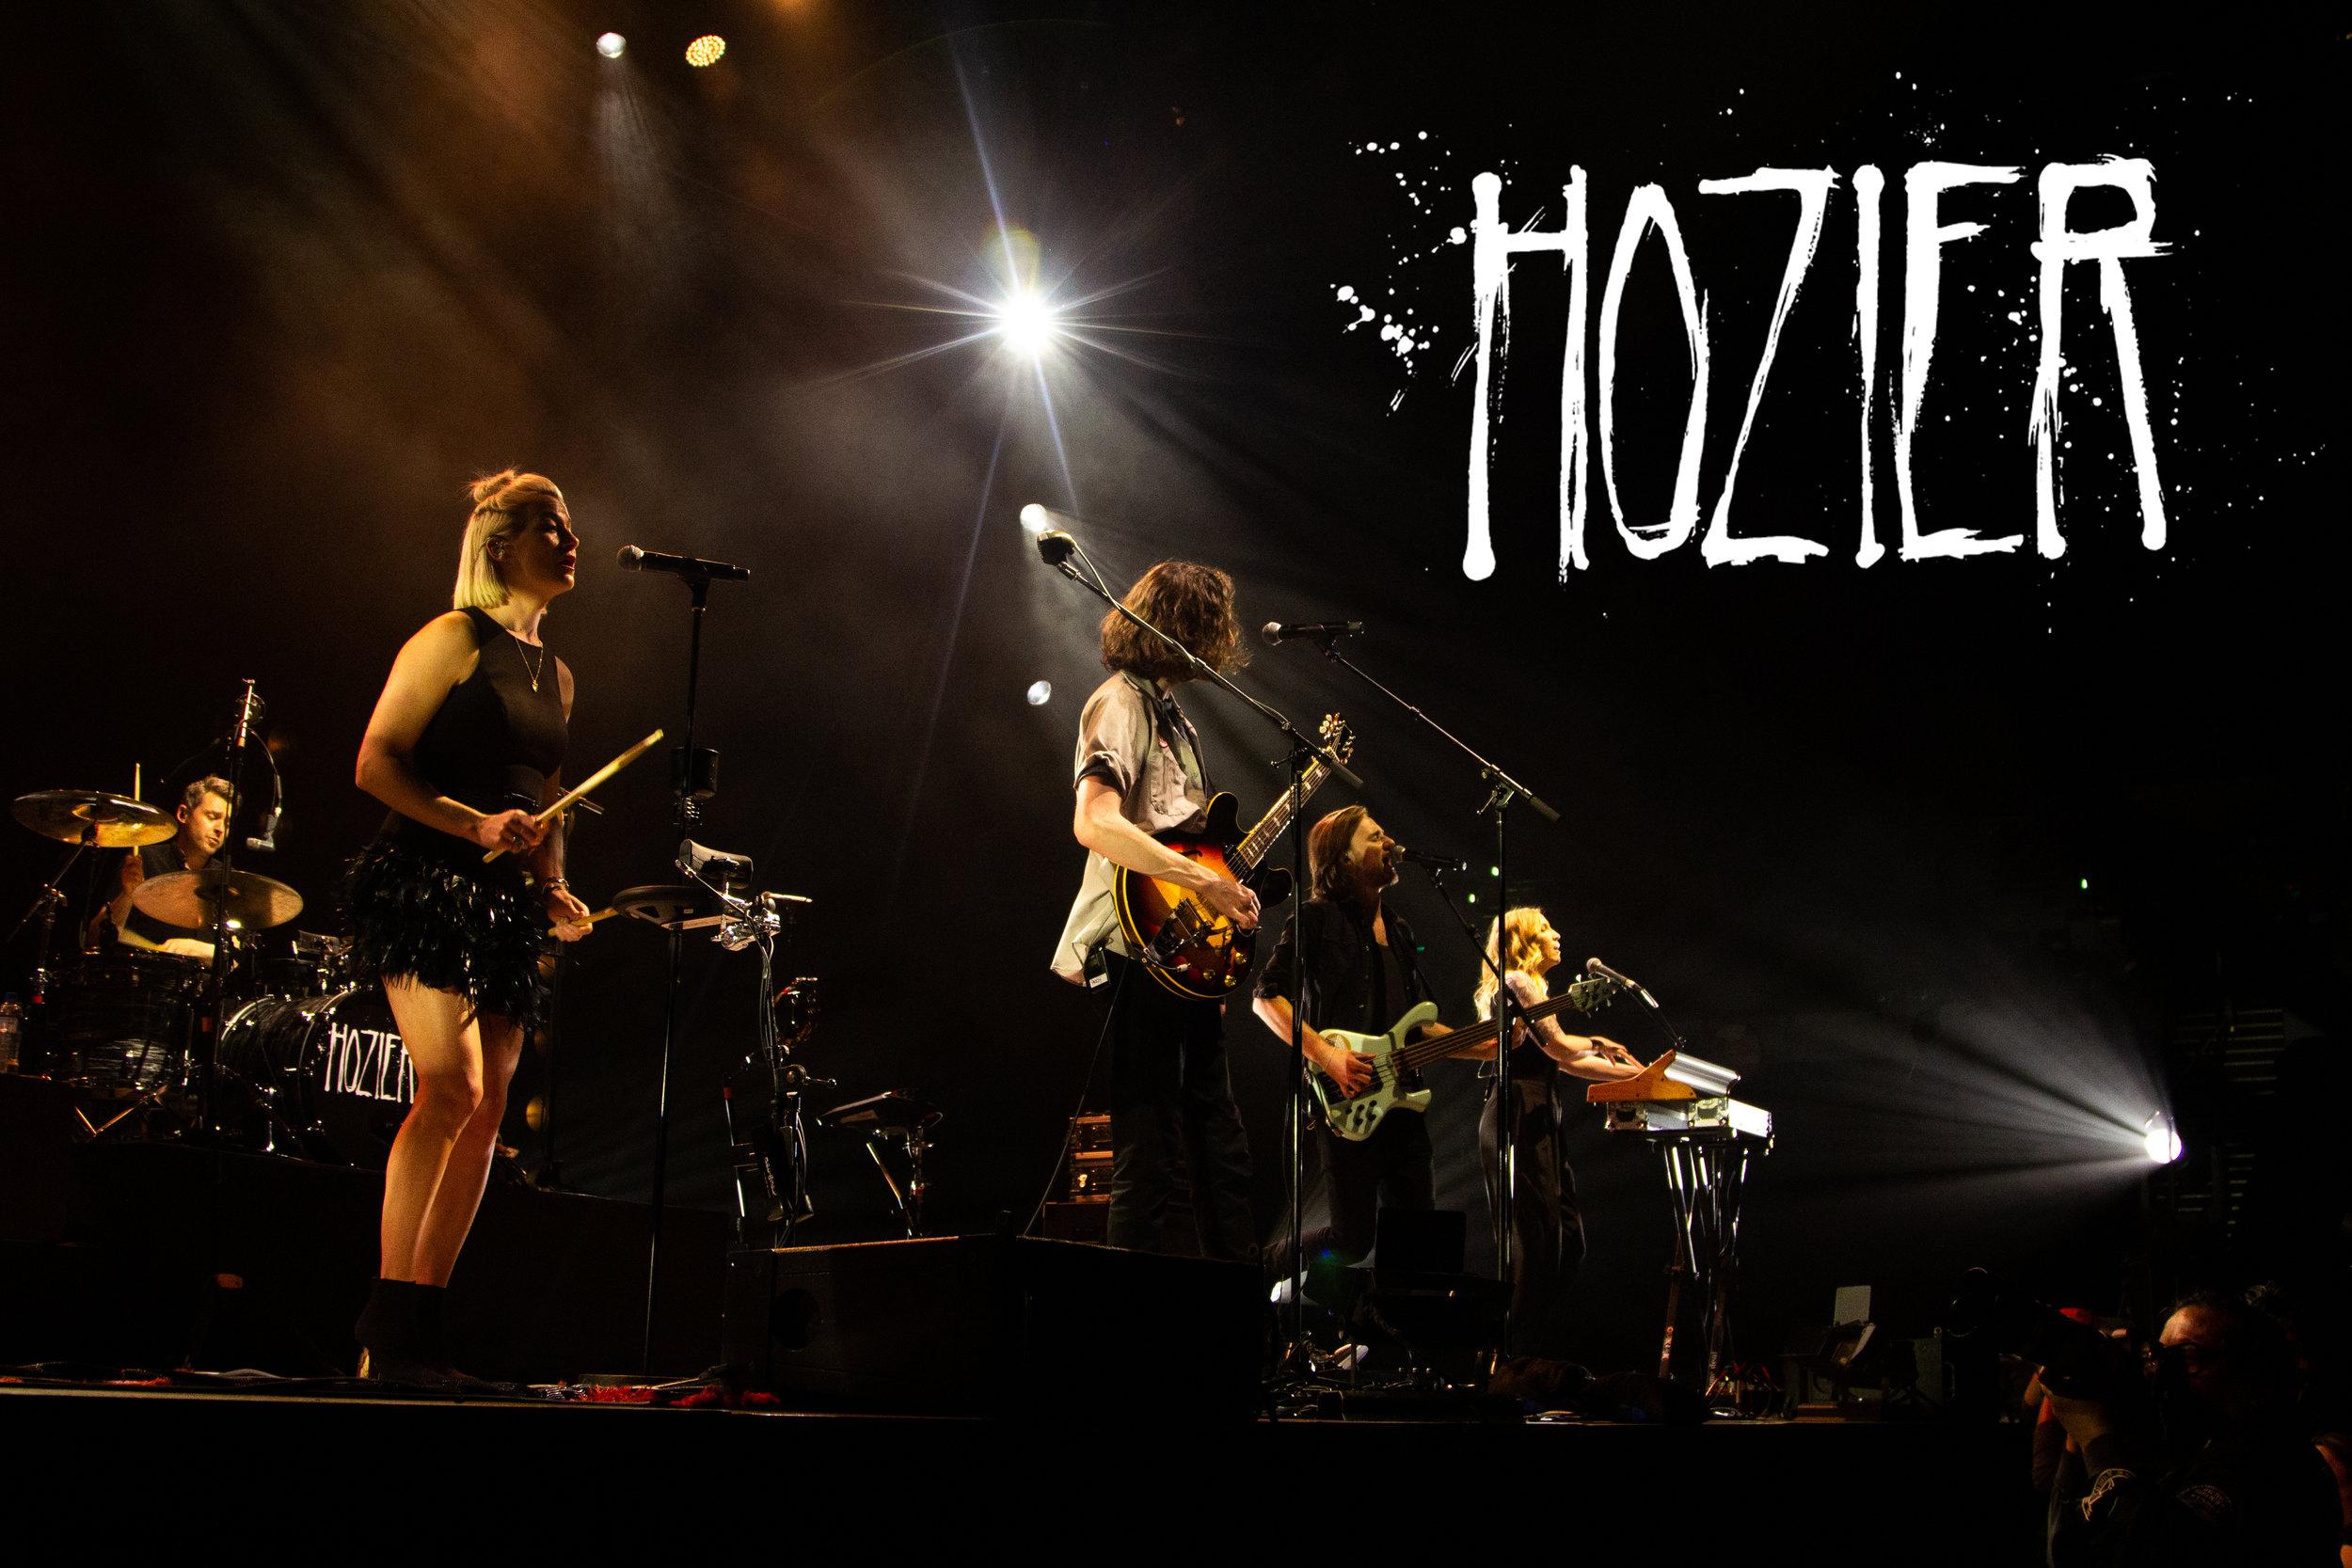 HOZIER-title-2.jpg